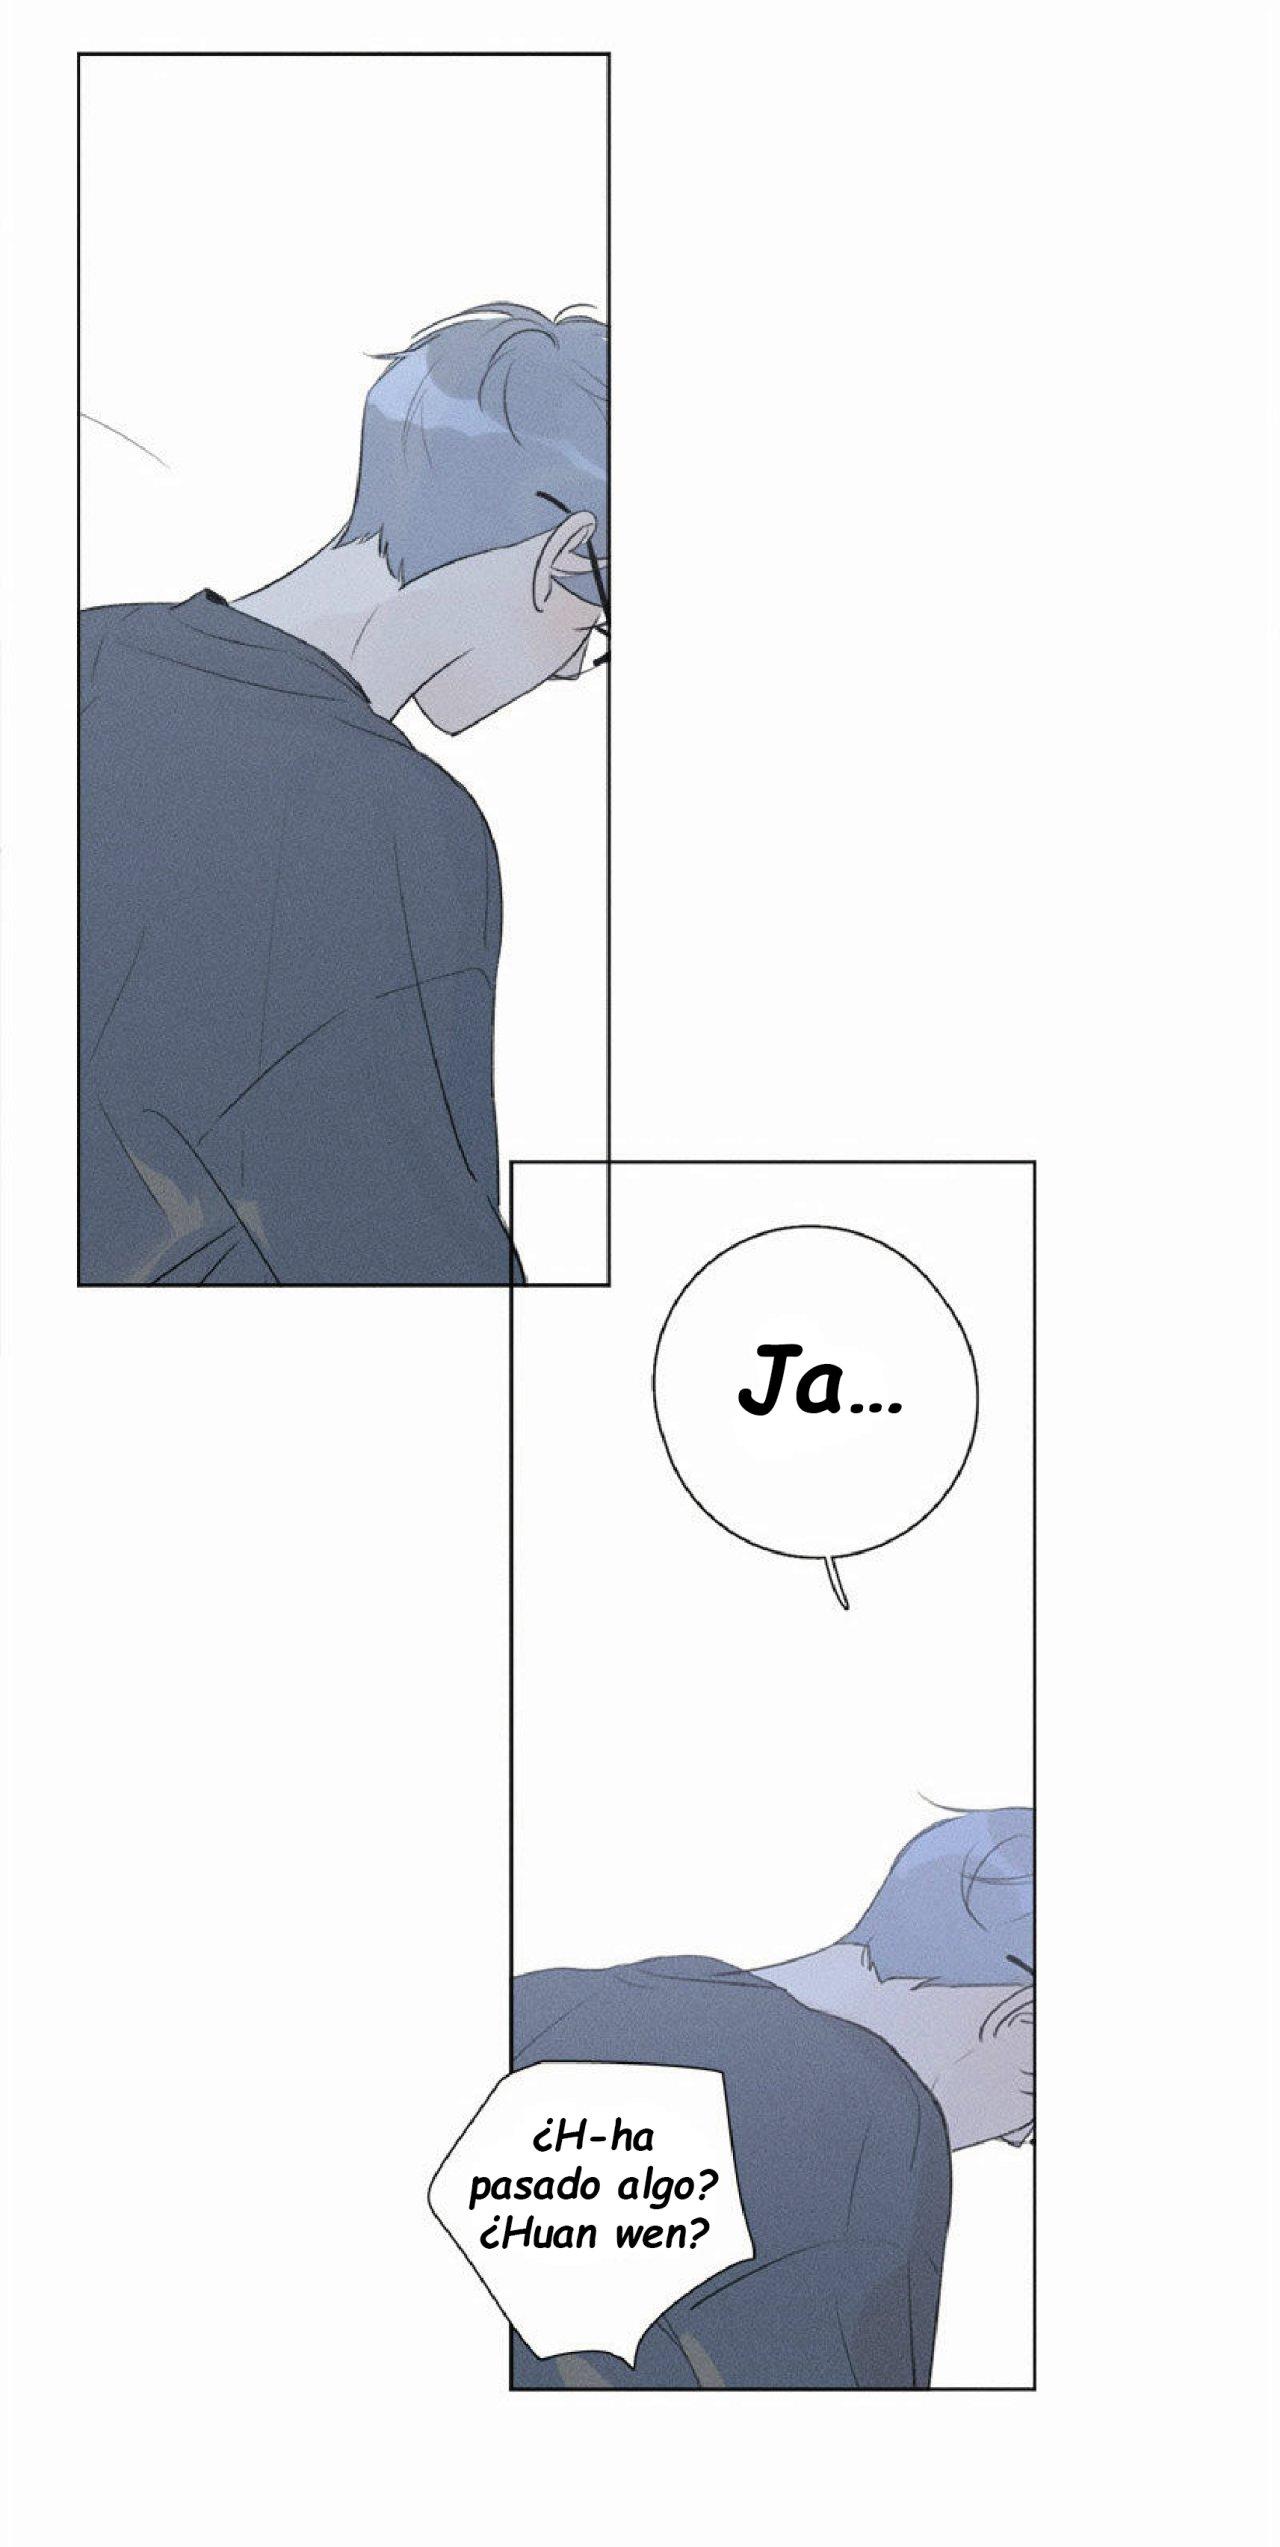 https://nine.mangadogs.com/es_manga/pic8/29/24925/957375/d0dd6d4eee5384c1fb5d140202274db1.jpg Page 34